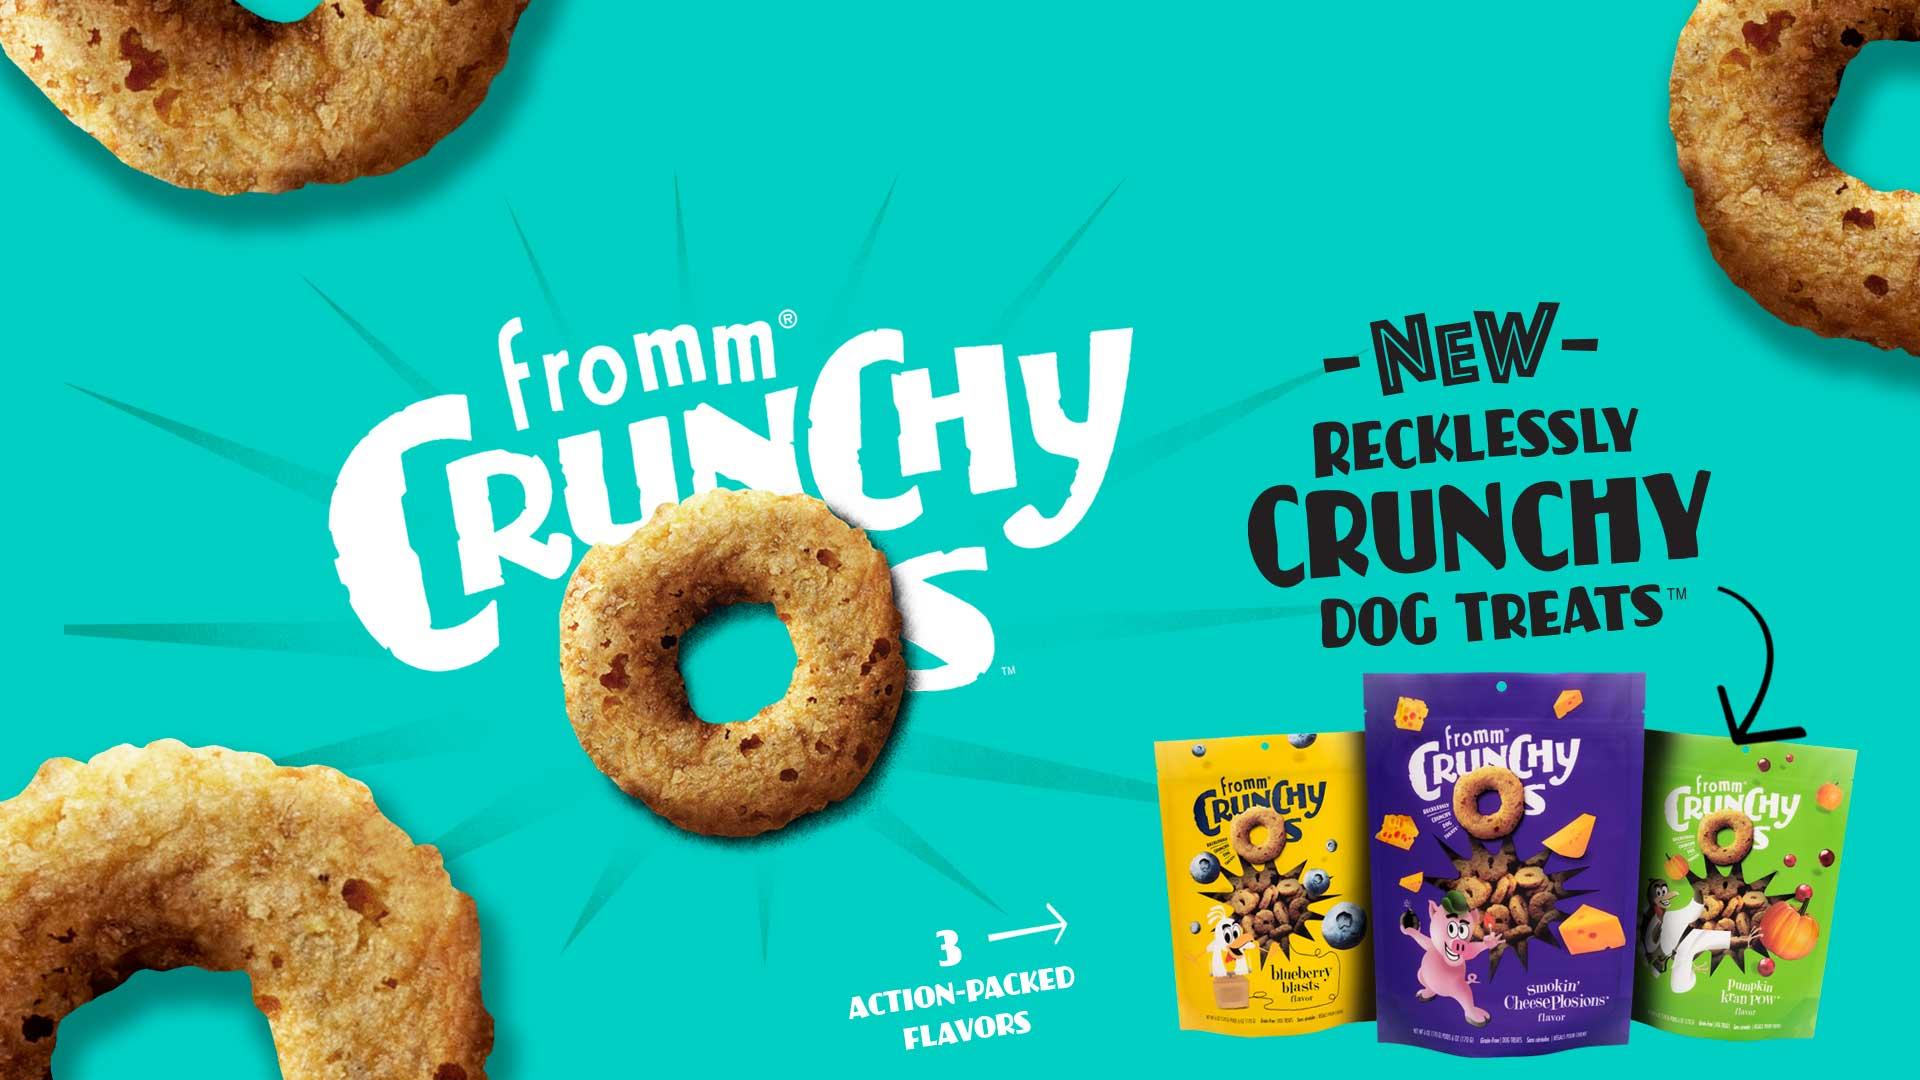 Crunchy Os